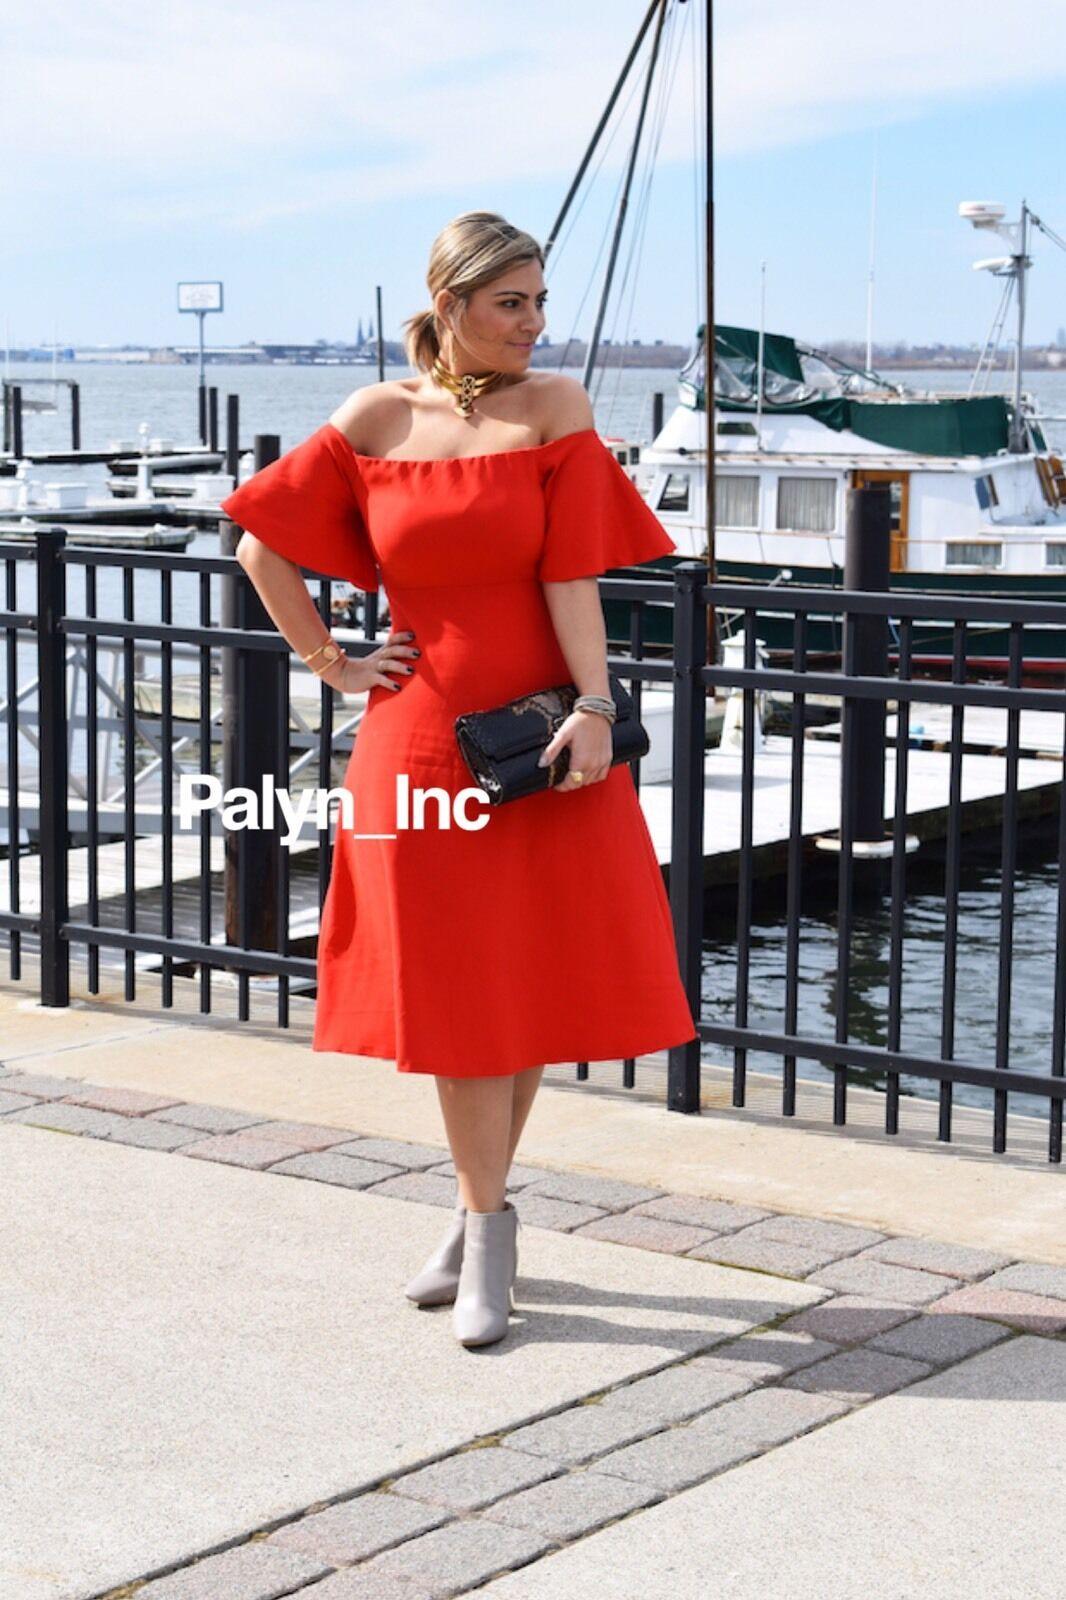 Raro _ _ _ Nwt Zara SS17 Rojo Hombros Al Descubierto Vestido Midi Vestido _ Xs S M L d7e557